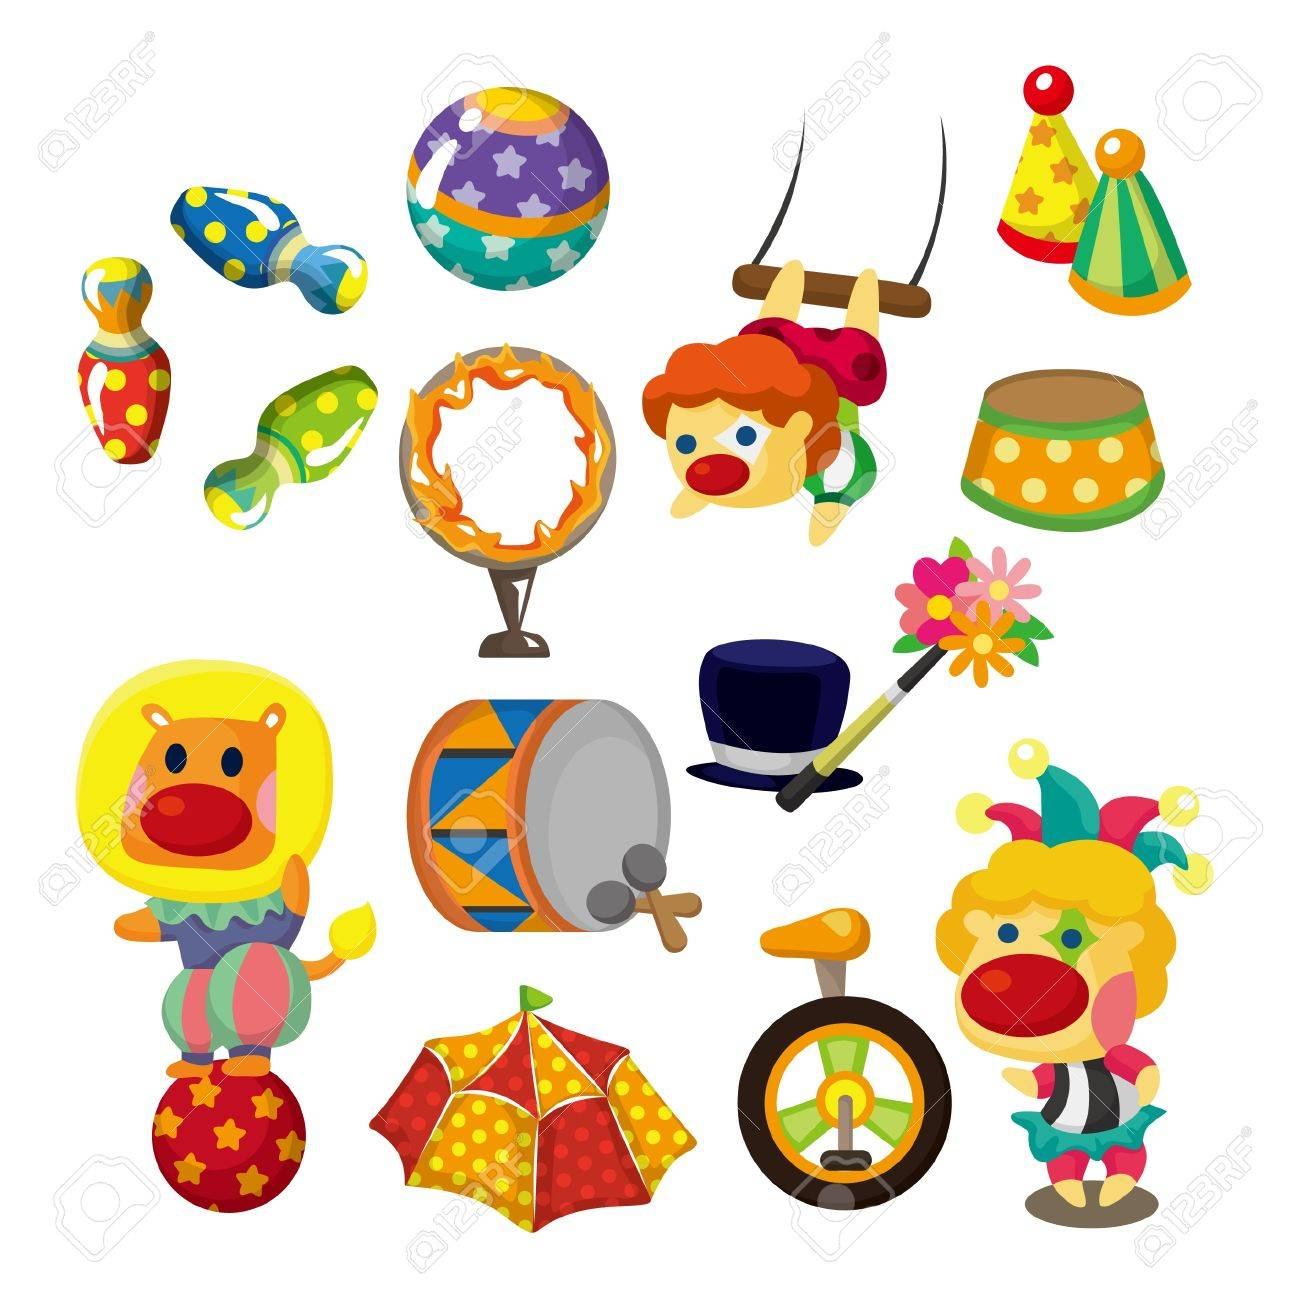 cartoon happy circus show icons collection Stock Vector - 10012274